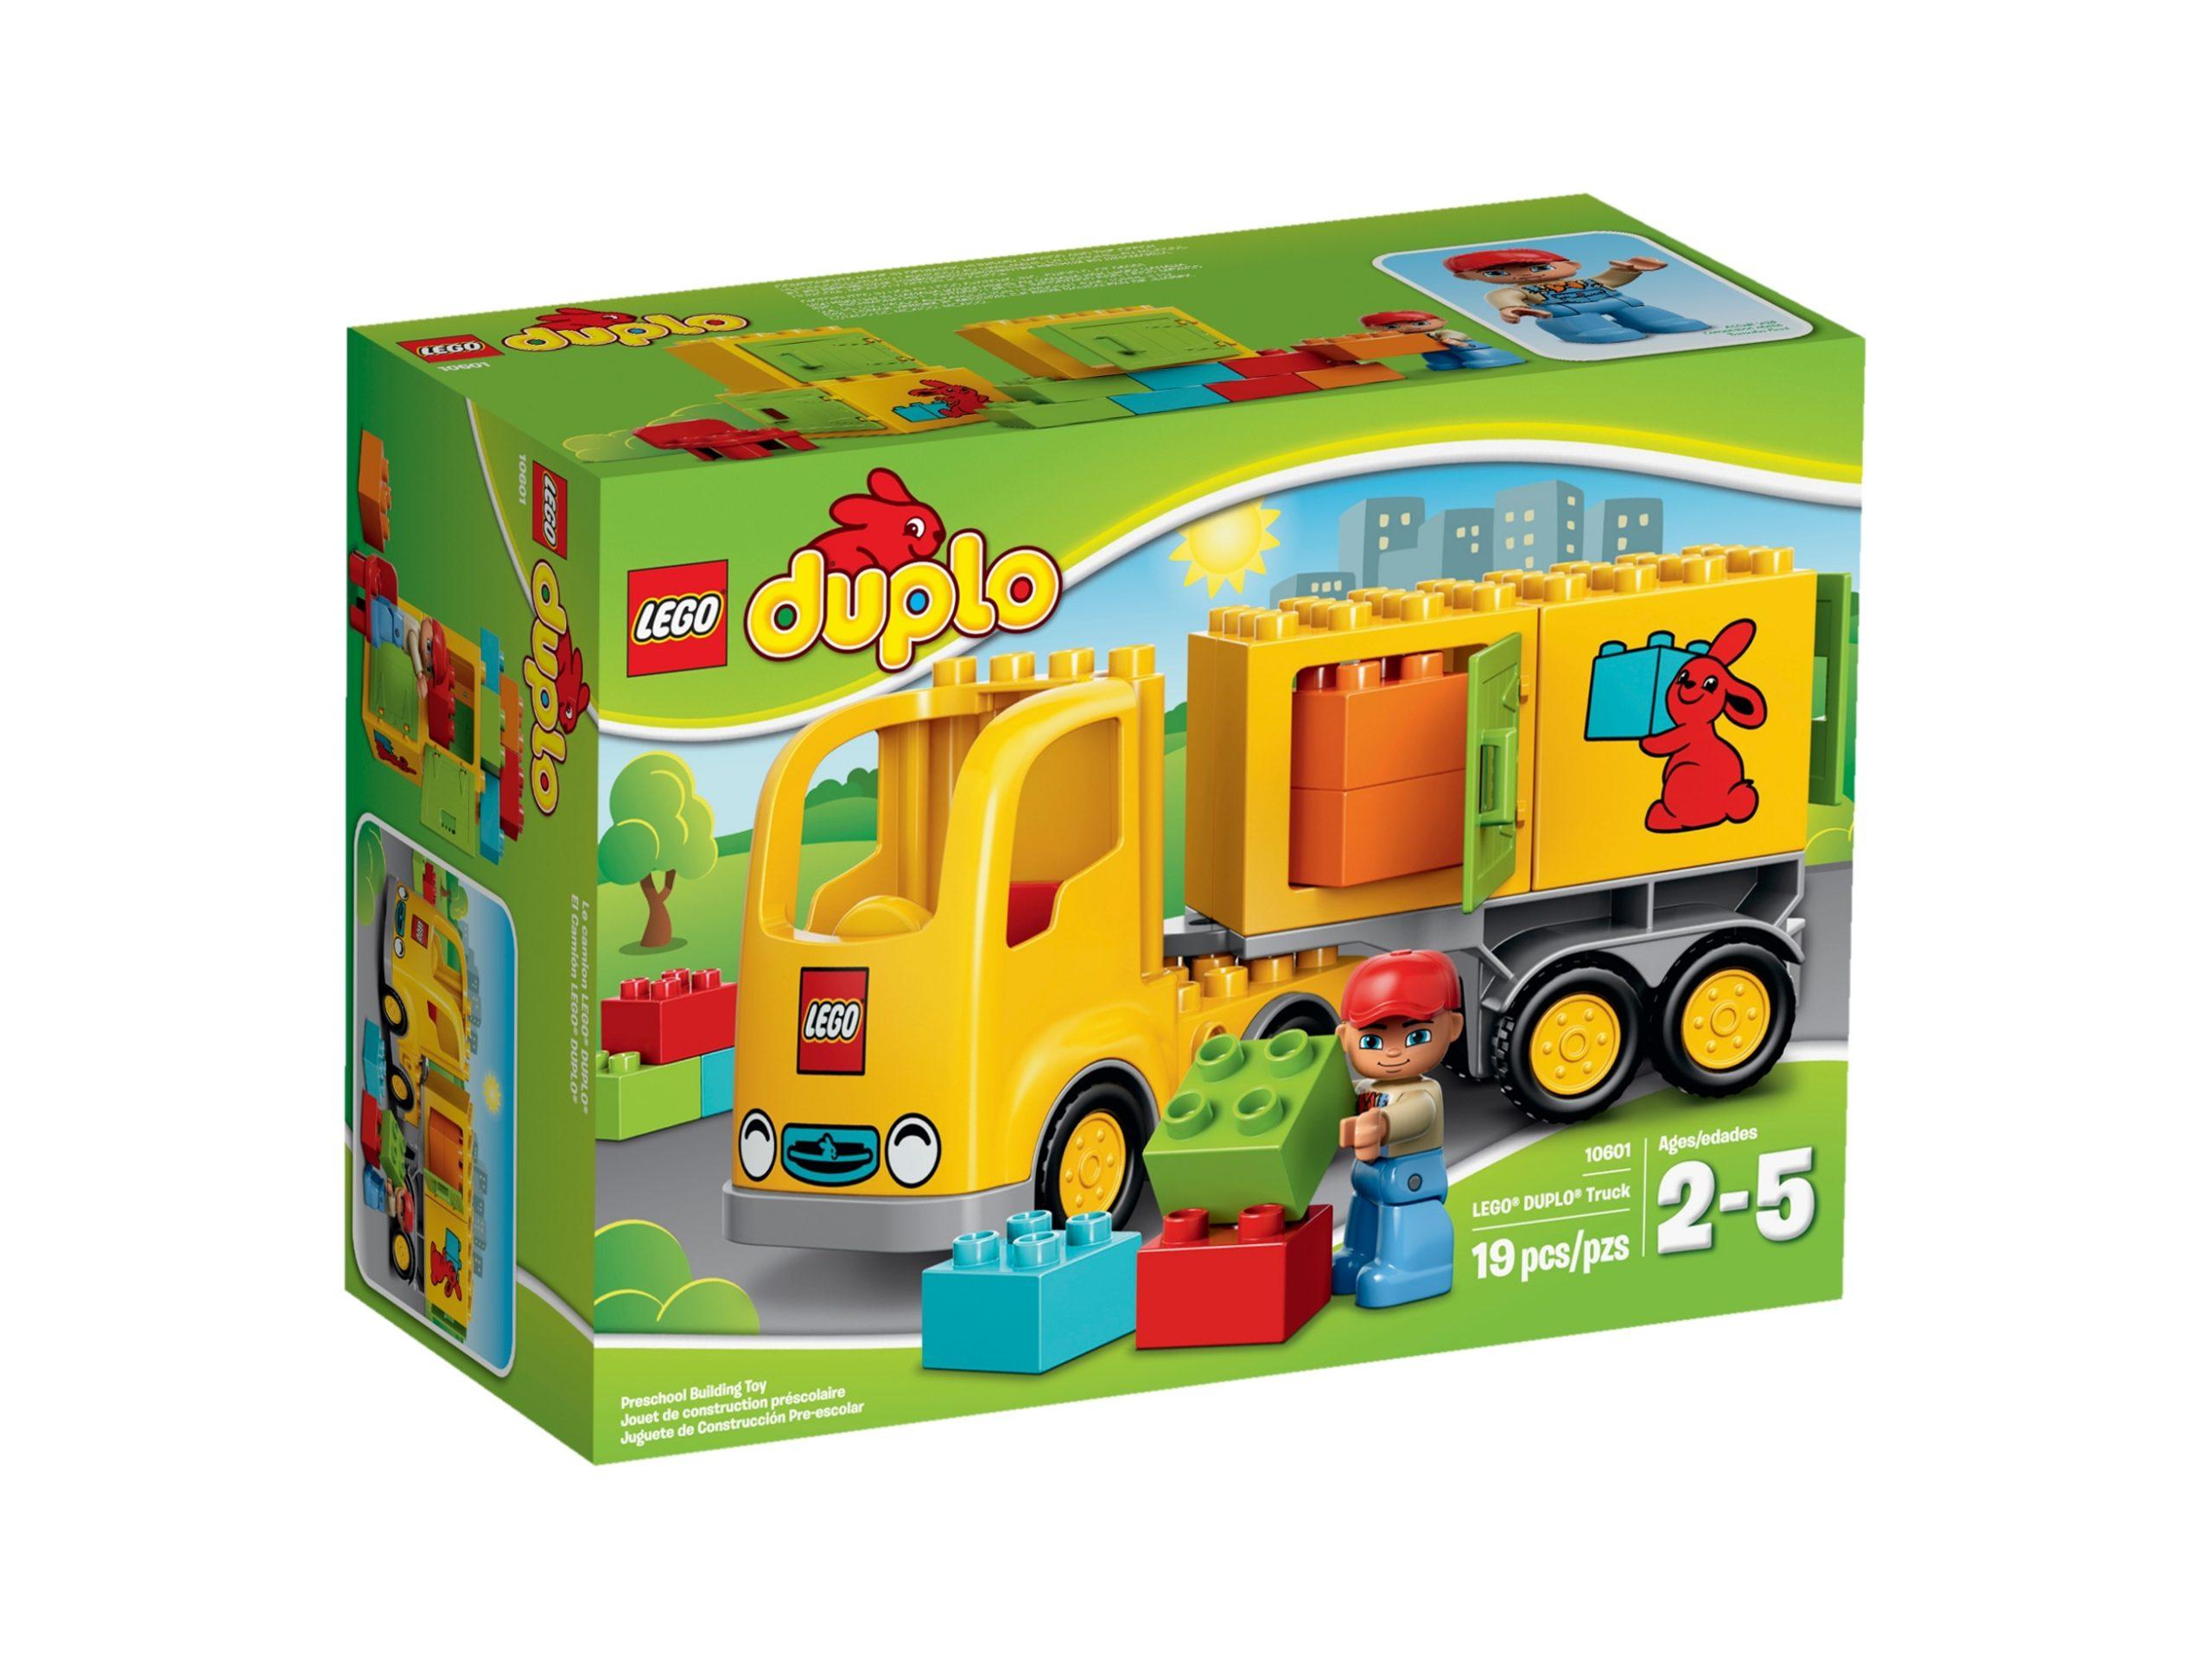 le camion lego 10601 duplo 10601 scaled